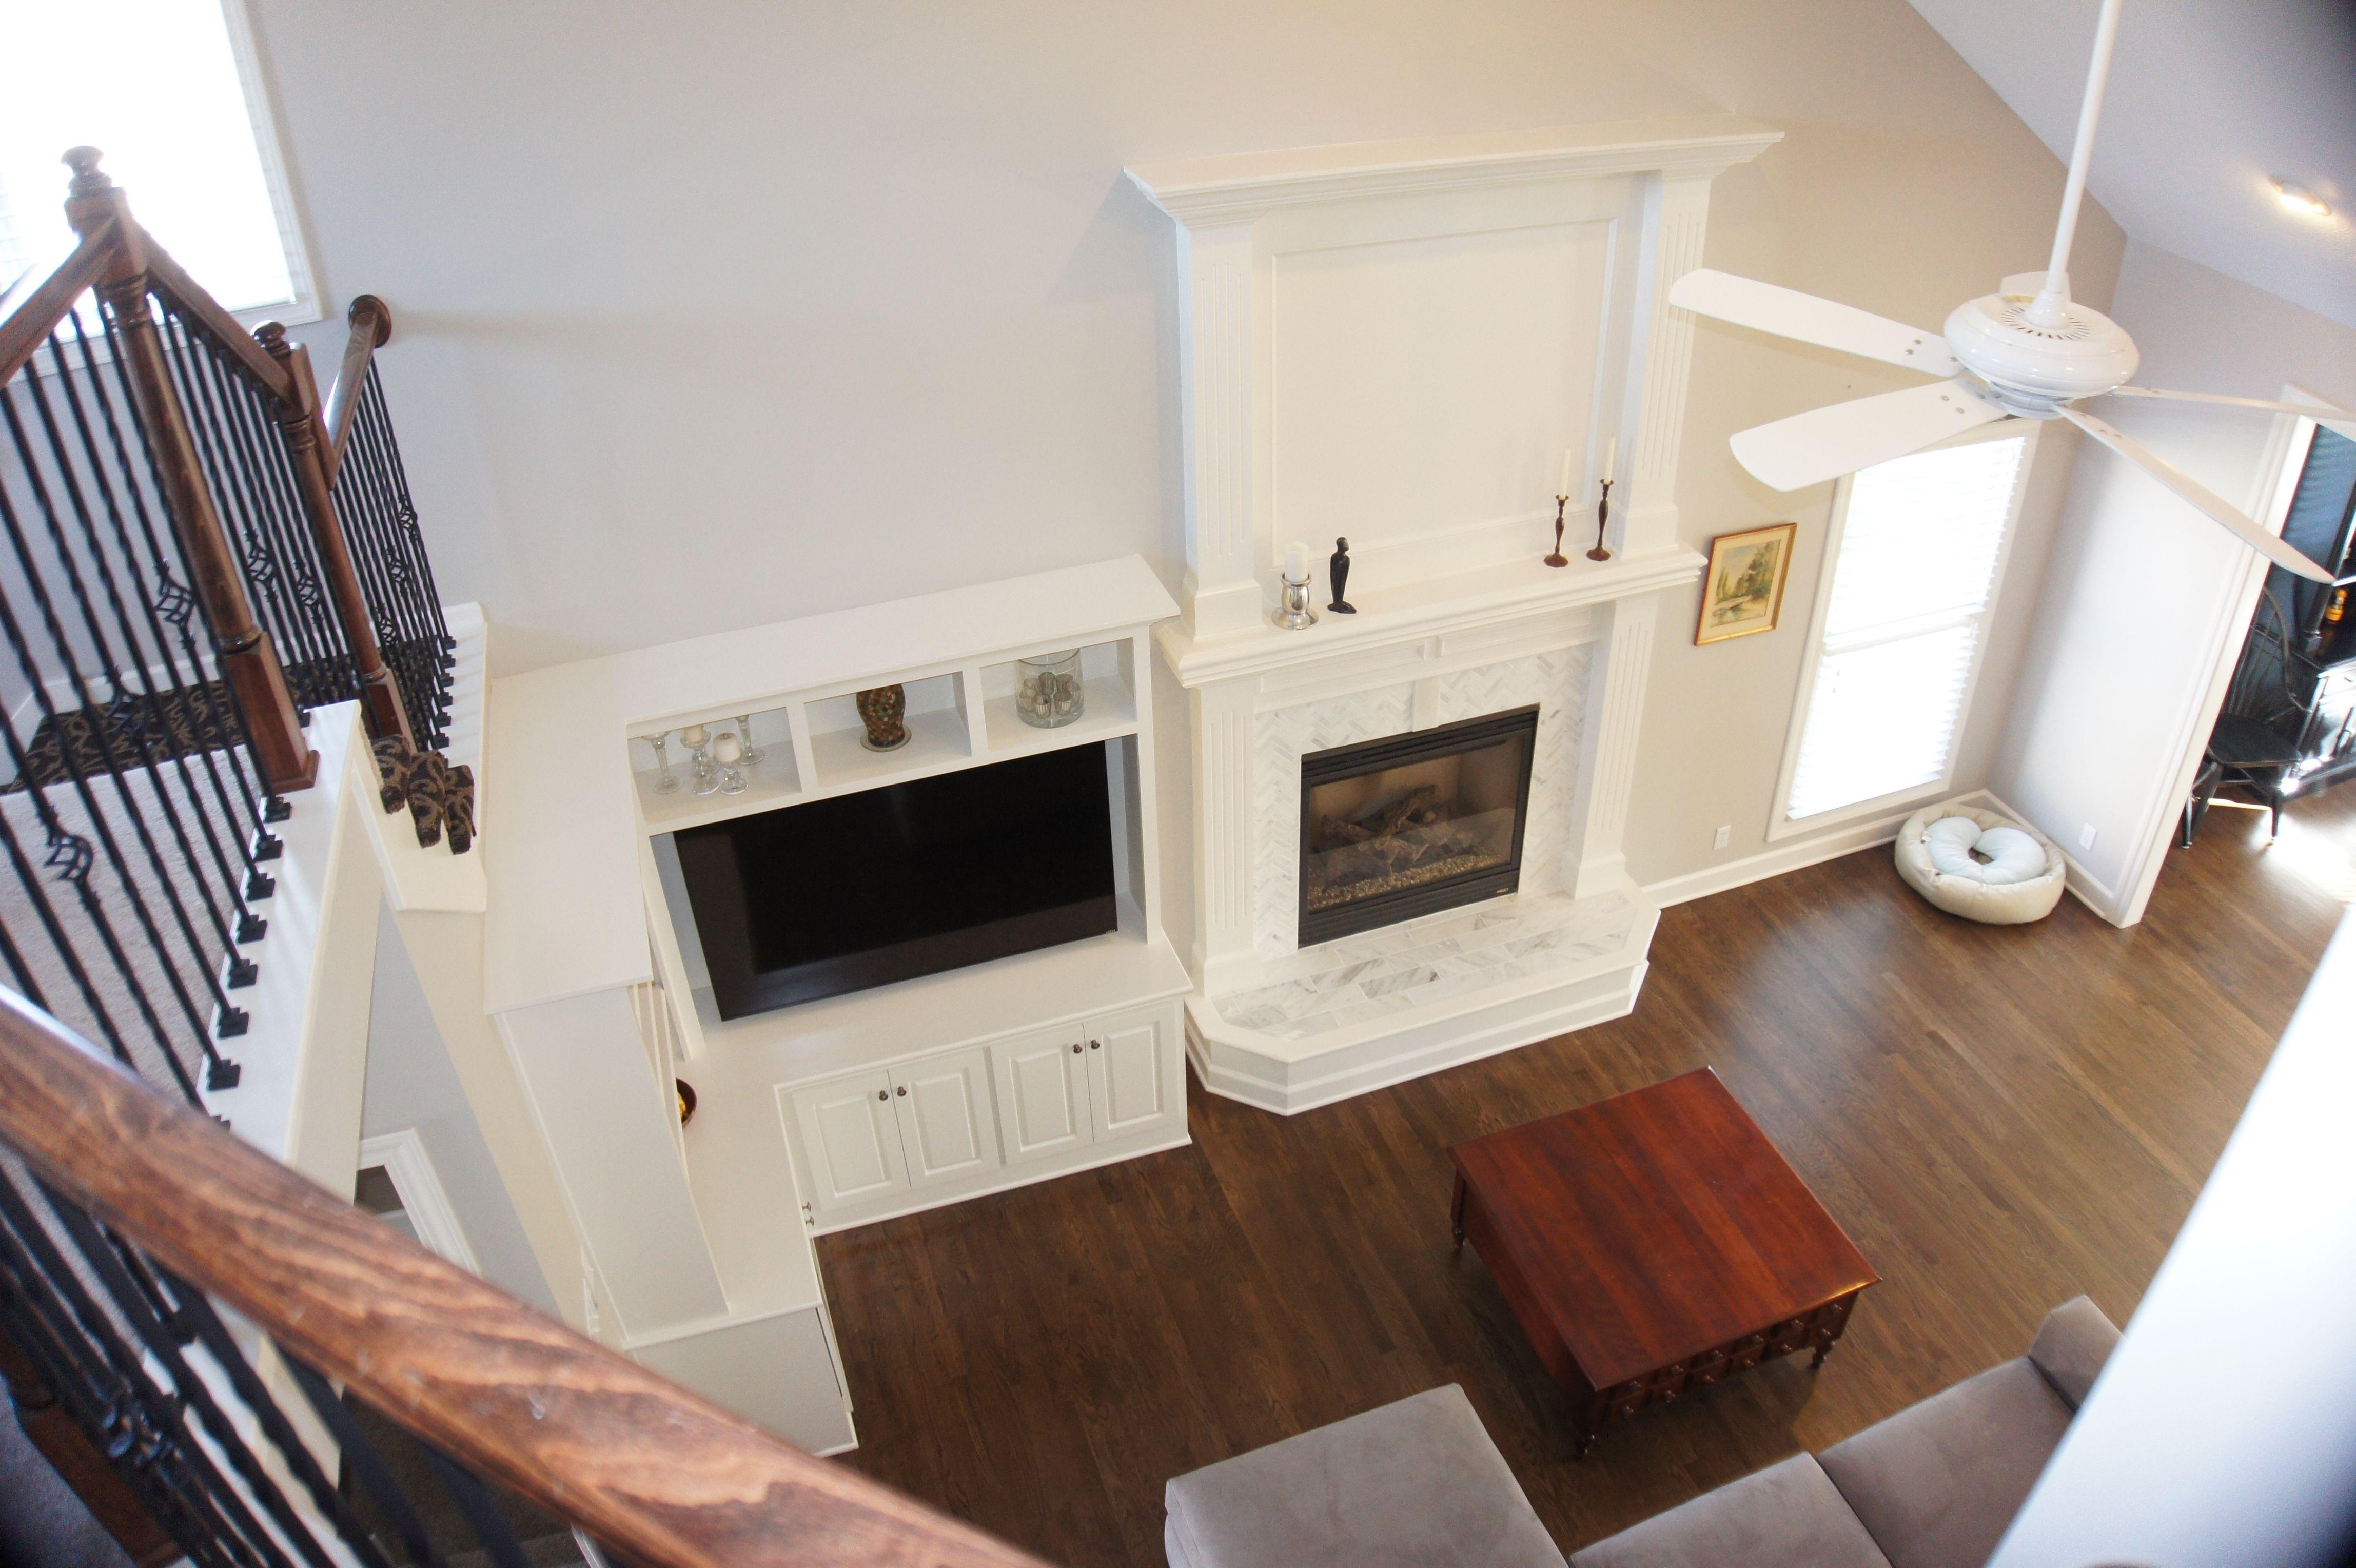 Overlooking living room refinish new built in